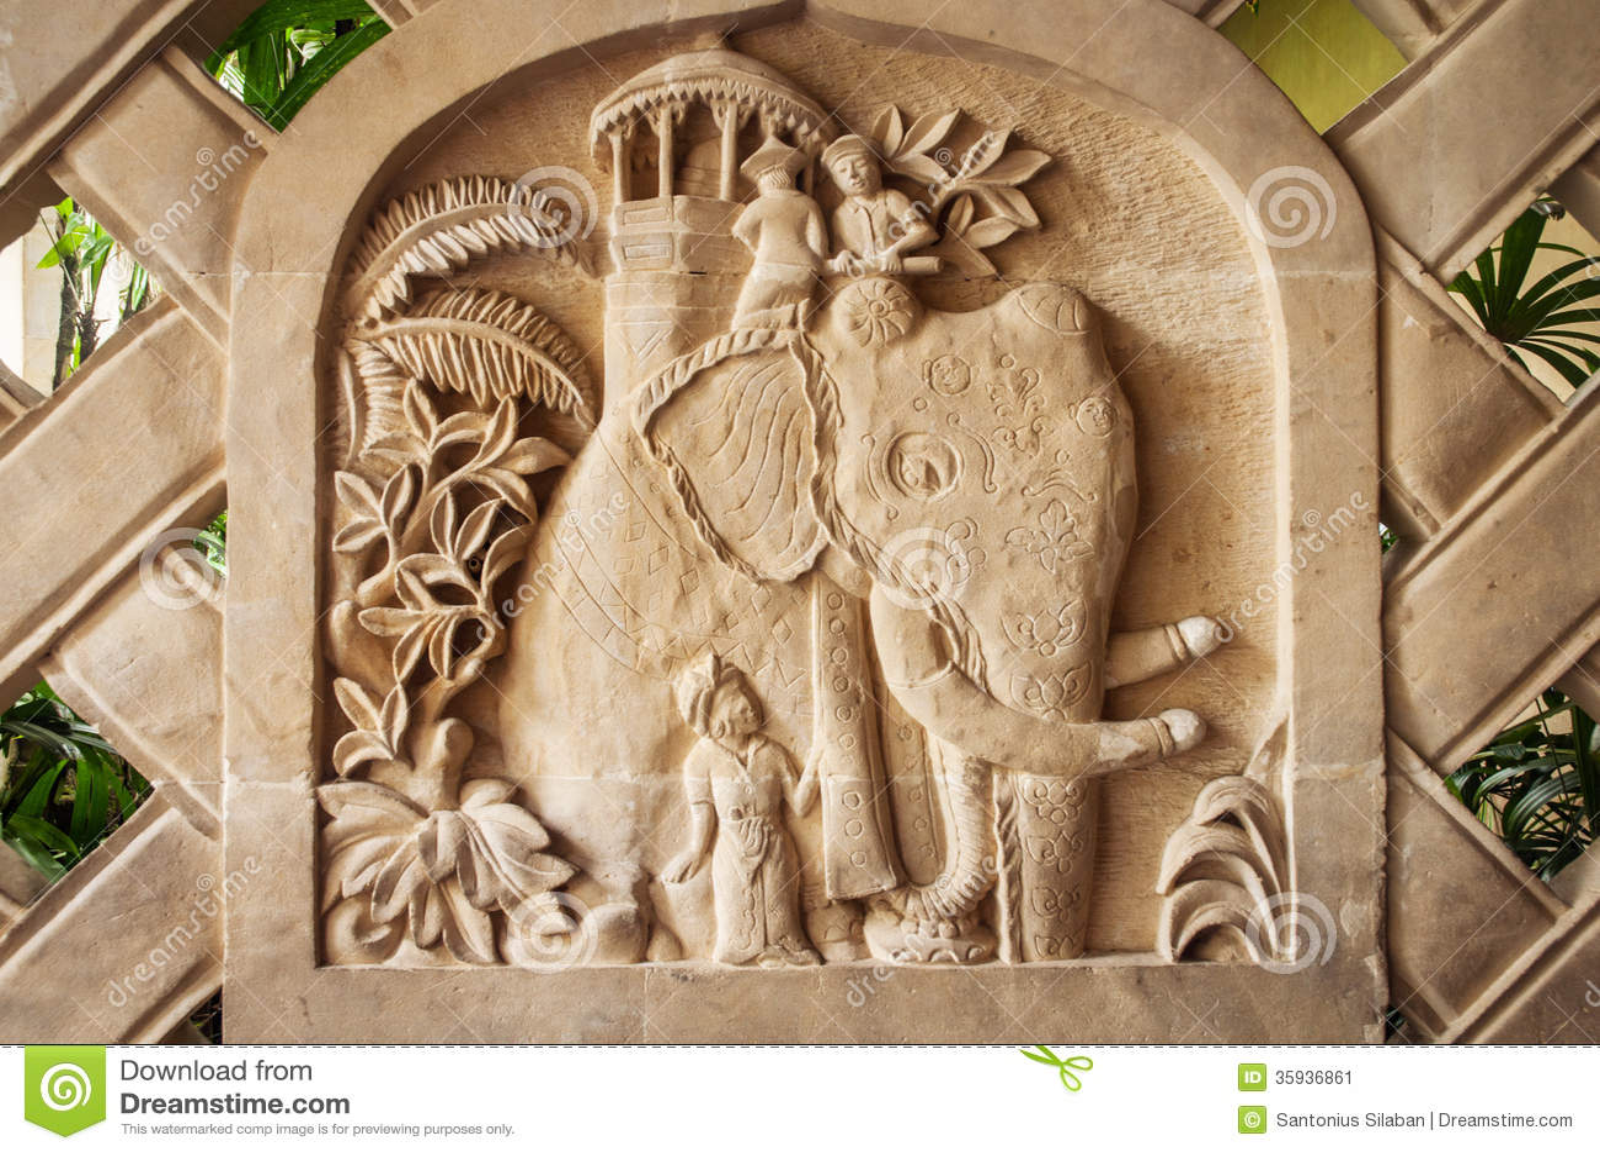 Bali limestone carving stock image